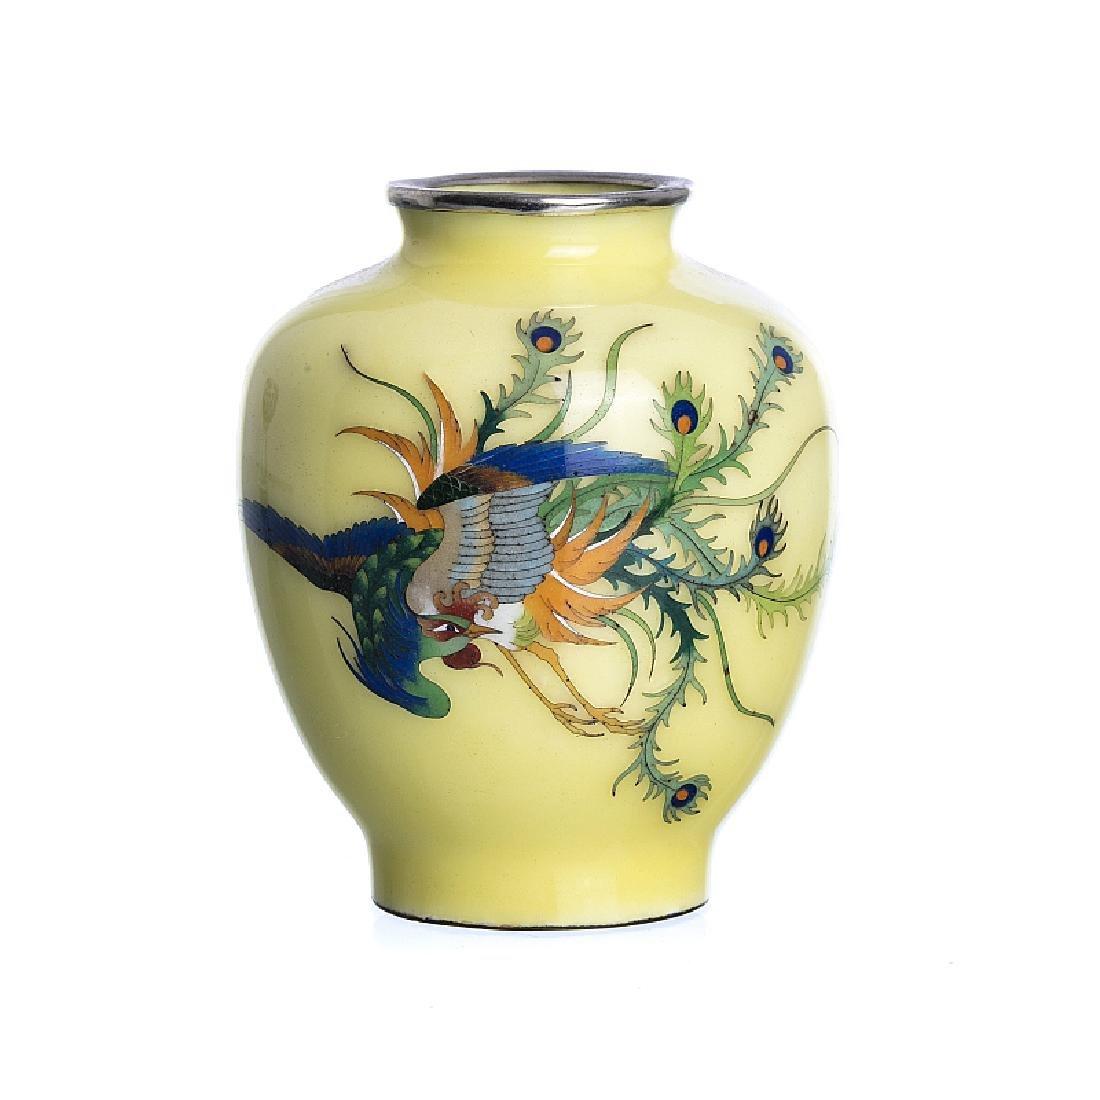 Small jar 'phoenix' in Japanese cloisonne